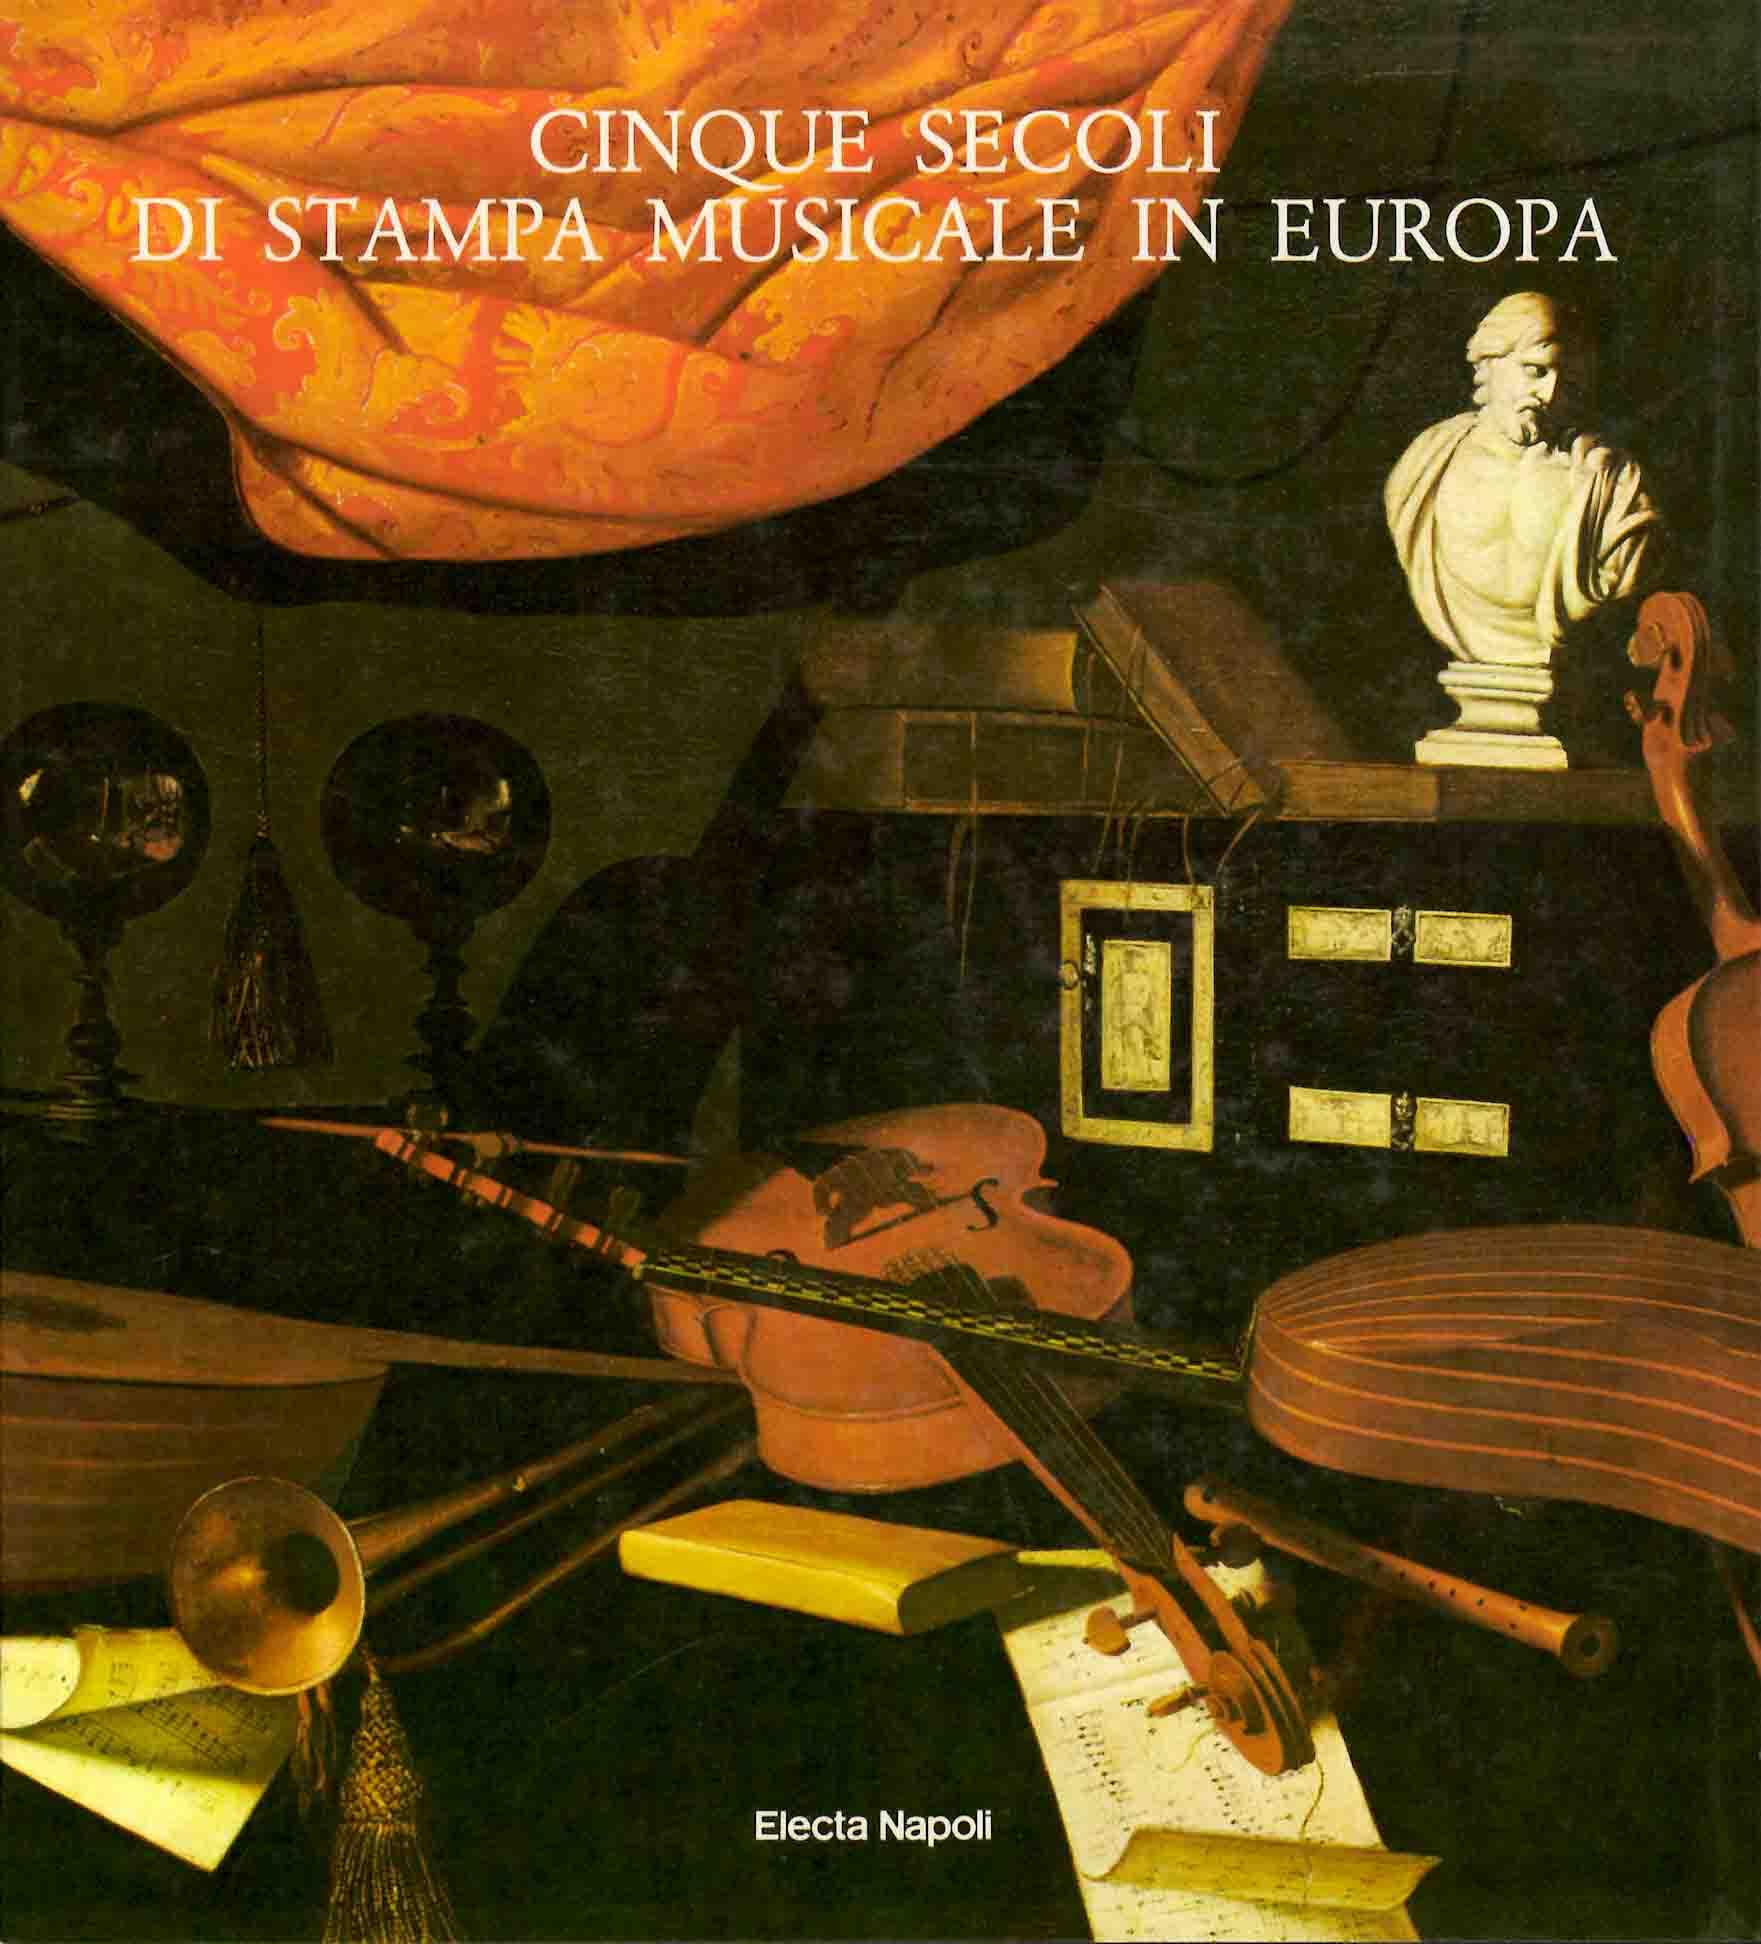 Cinque secoli di stampa musicale in Europa